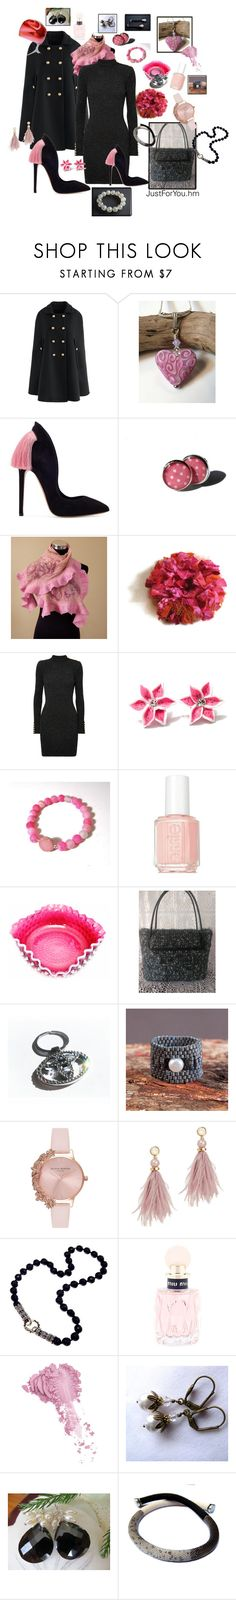 """Gift ideas for Valentine's Day!"" by justforyouhm on Polyvore featuring moda, Chicwish, Cadeau, Balmain, Essie, BMW, Olivia Burton, Lizzie Fortunato, Miu Miu e Bésame"